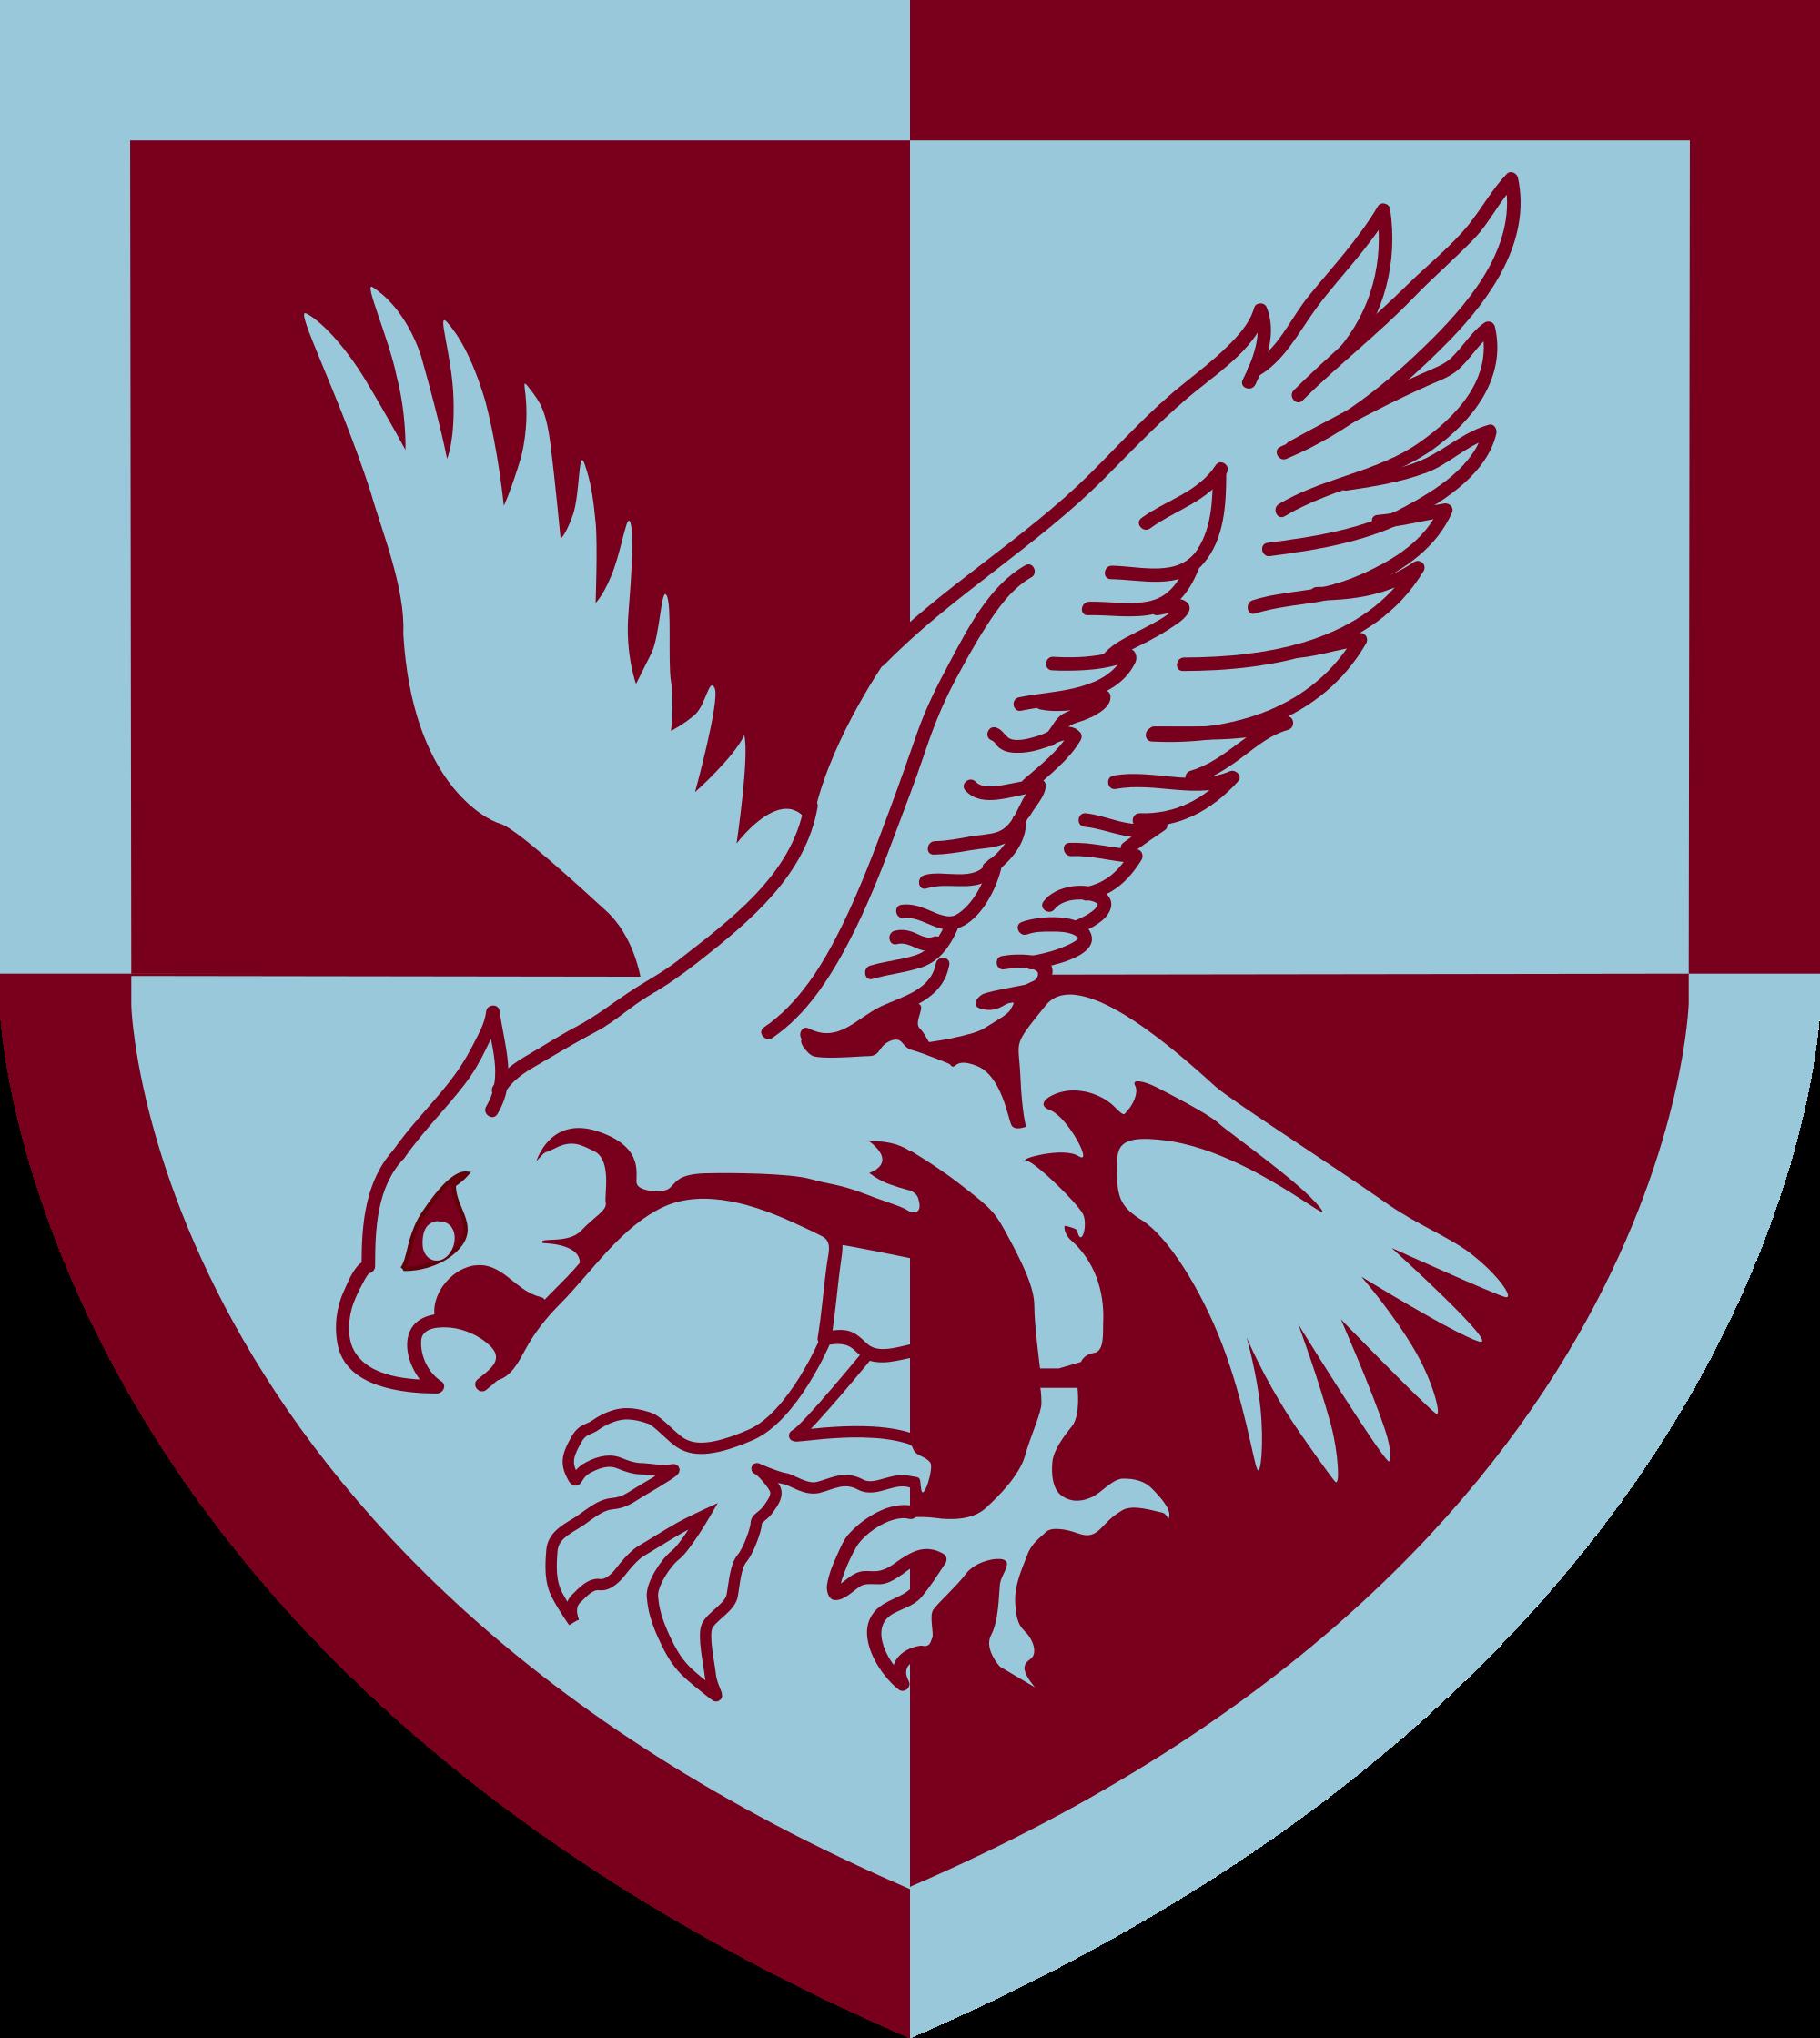 Air assault badge clipart transparent download 16th 16 Air Assault Brigade Badge | НАШИВКИ | Military insignia ... transparent download